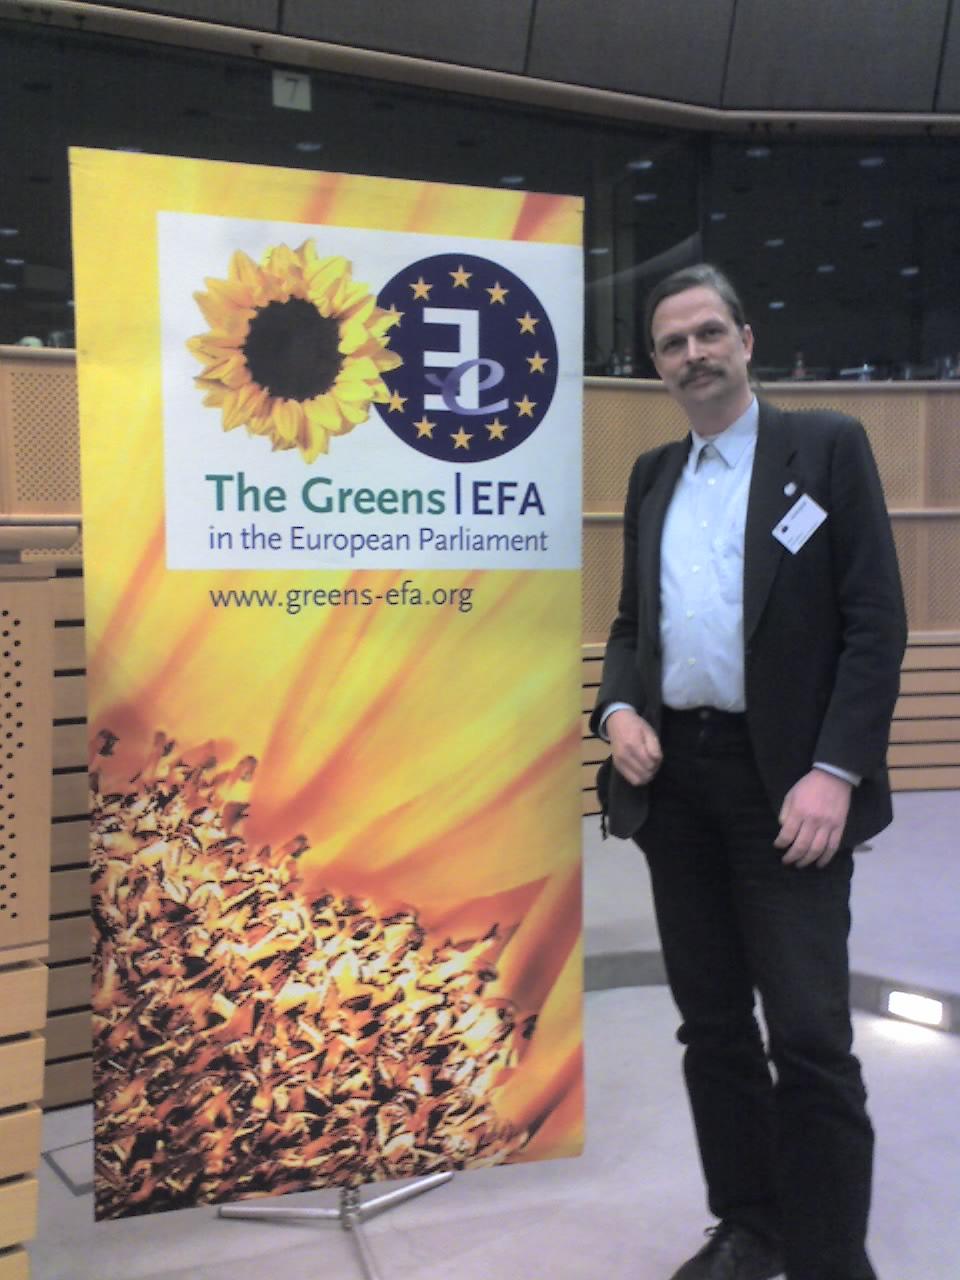 Wolfgang G. Wettach im Europaparlament in Brüssel im Saal Petra Kelly.